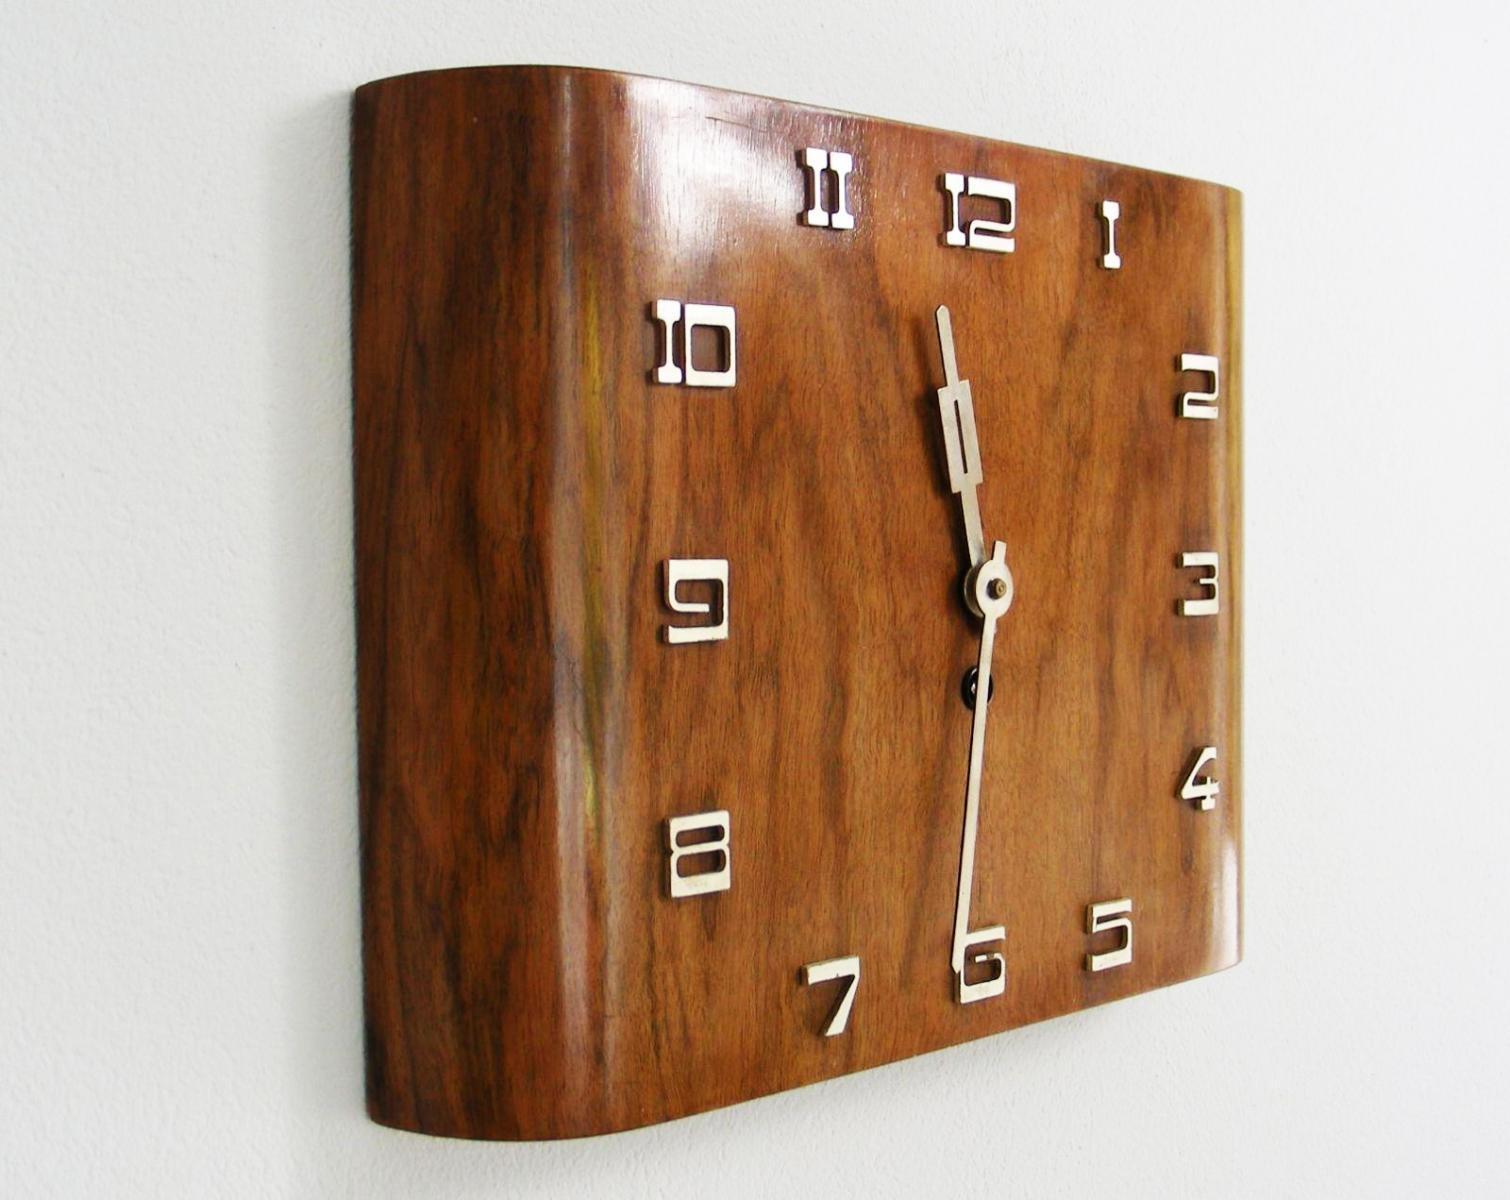 Art Deco Wall Clock | Roselawnlutheran Throughout Art Deco Wall Clocks (Image 5 of 20)